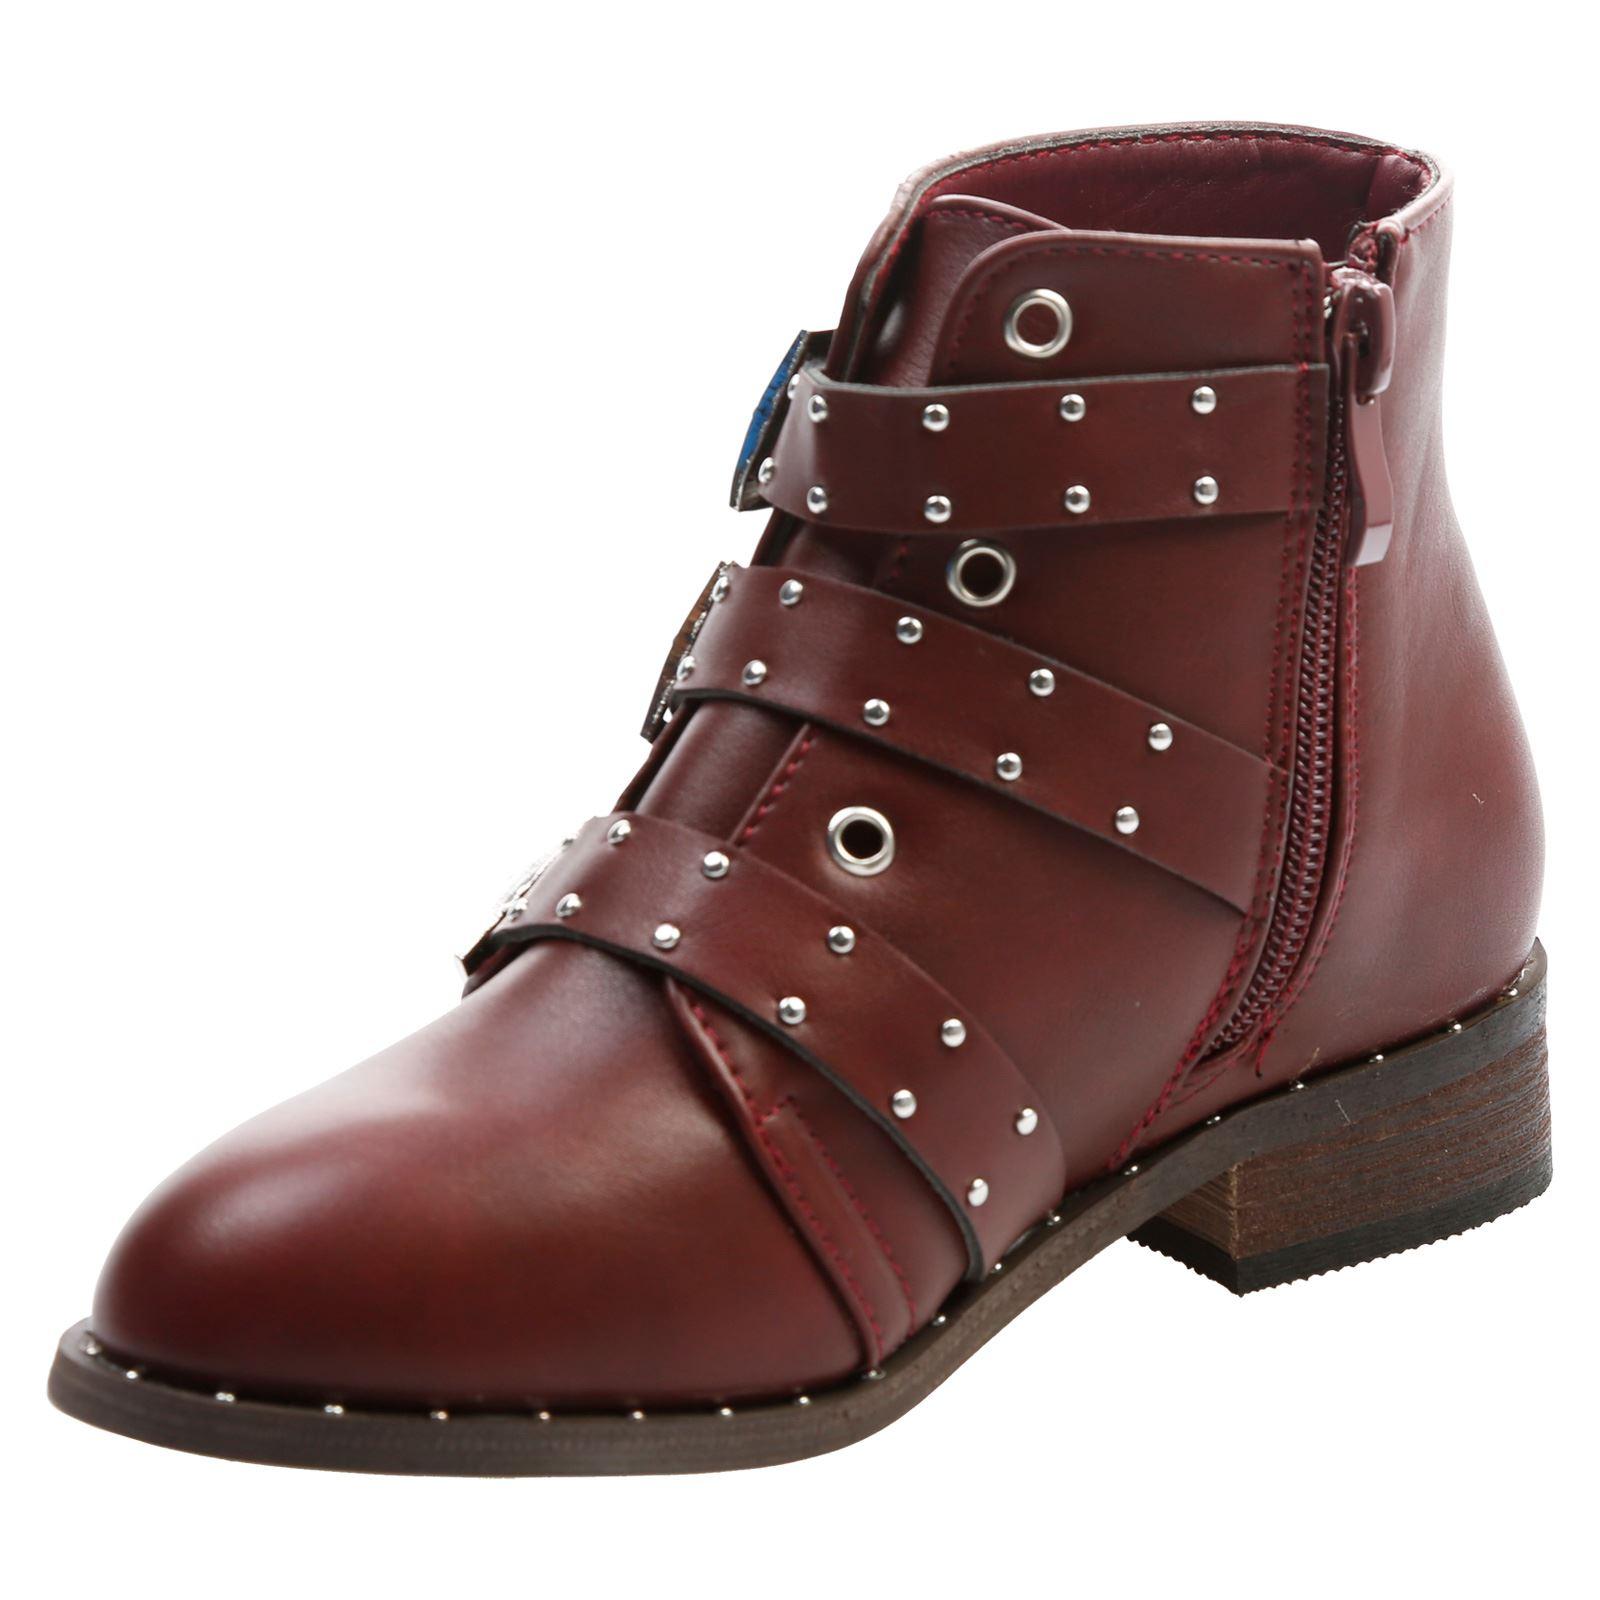 Aurelia Girls Kids Flats Low Heels Studded Buckle Biker Ankle Boots Shoes Size